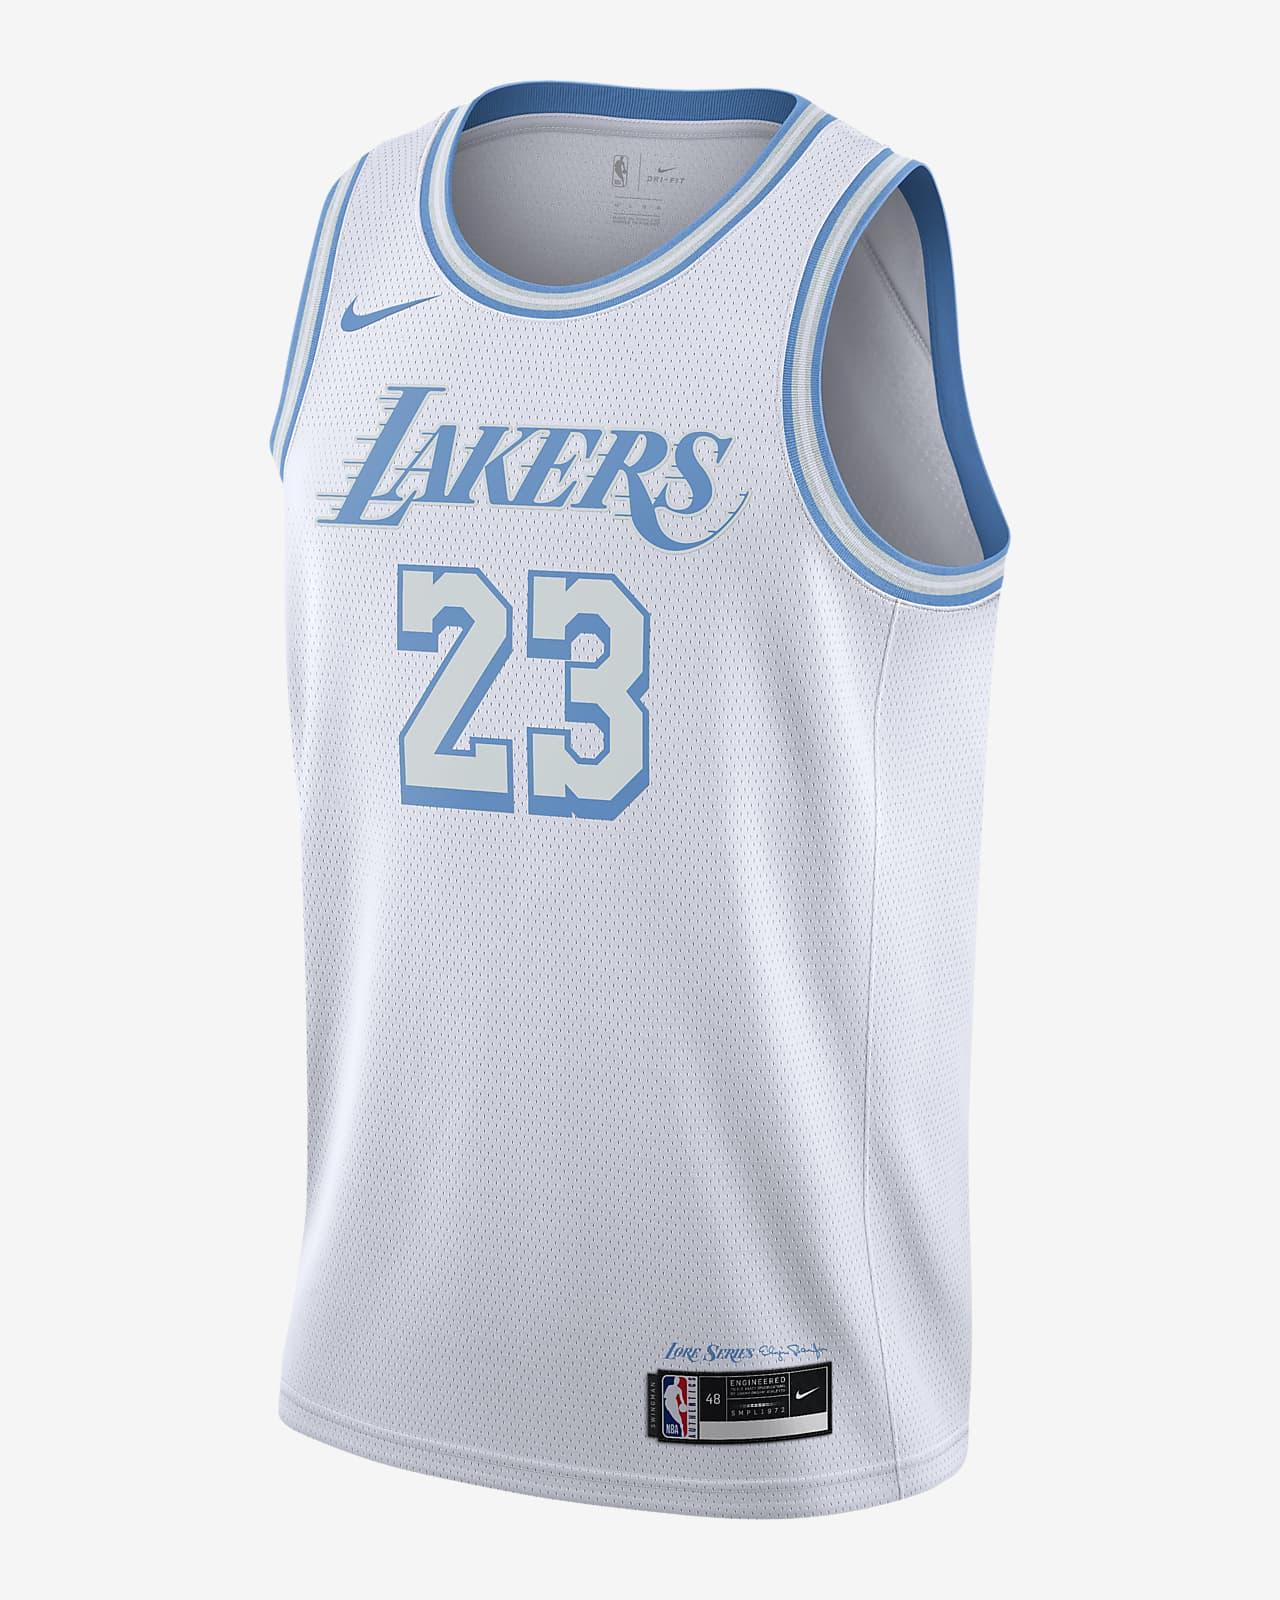 Maillot Nike NBA Swingman Los Angeles Lakers City Edition